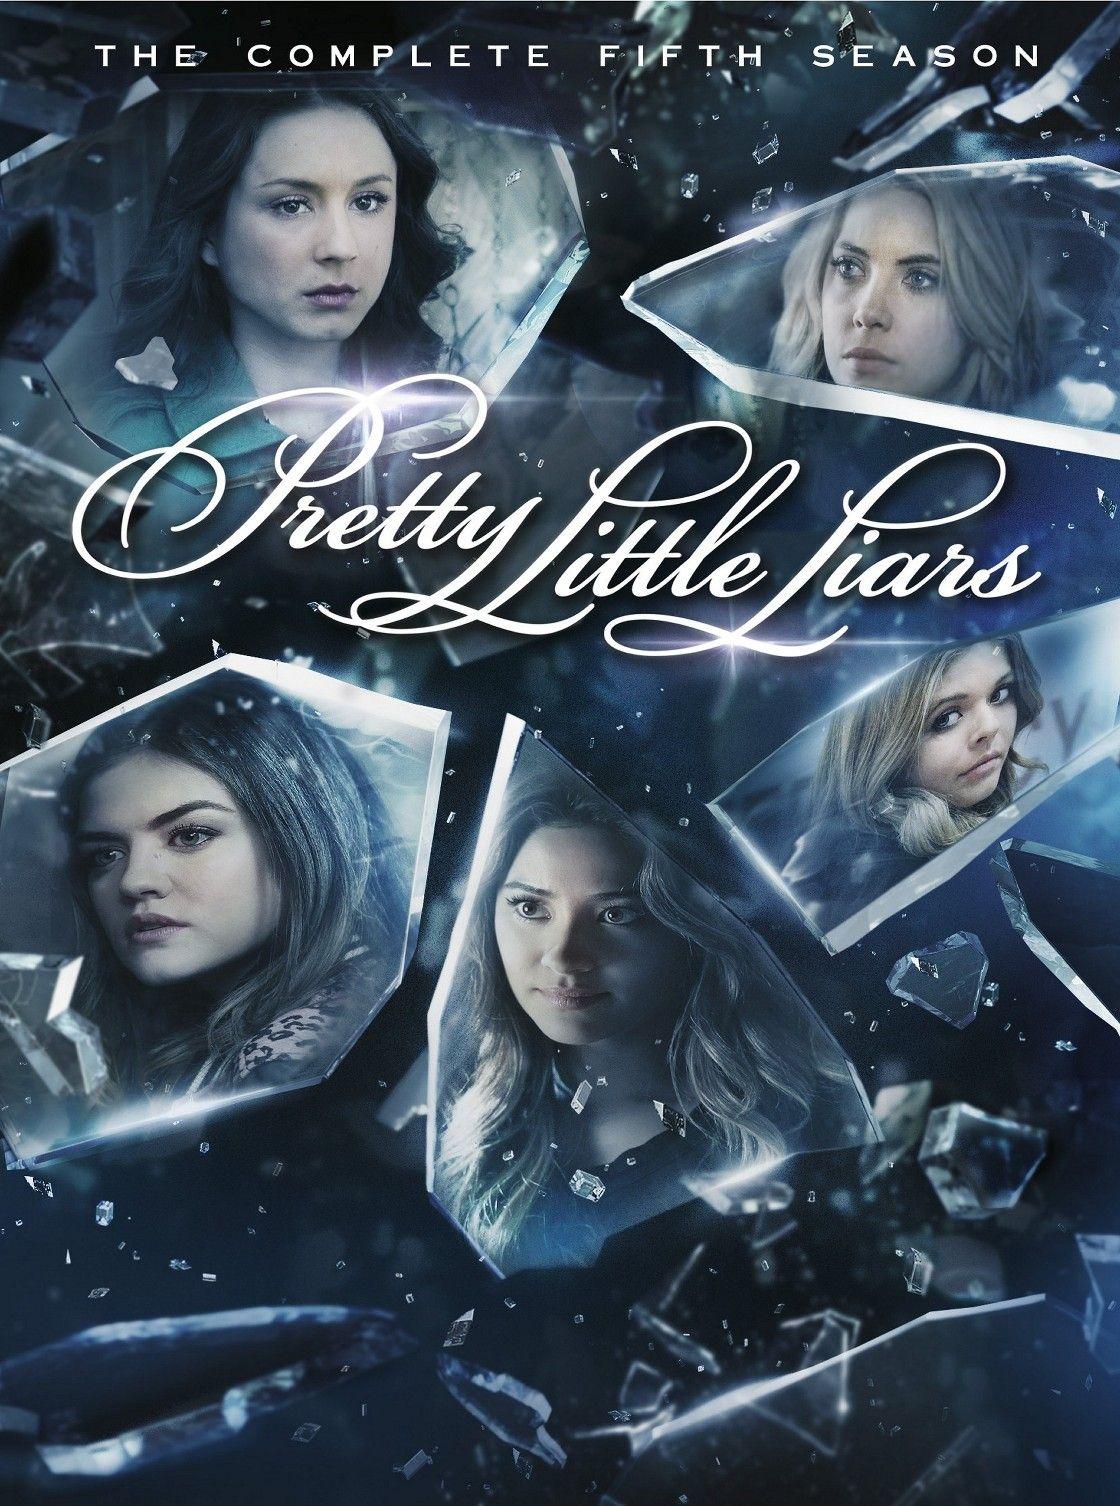 Pretty Little Liars The Complete Fifth Season [5 Discs